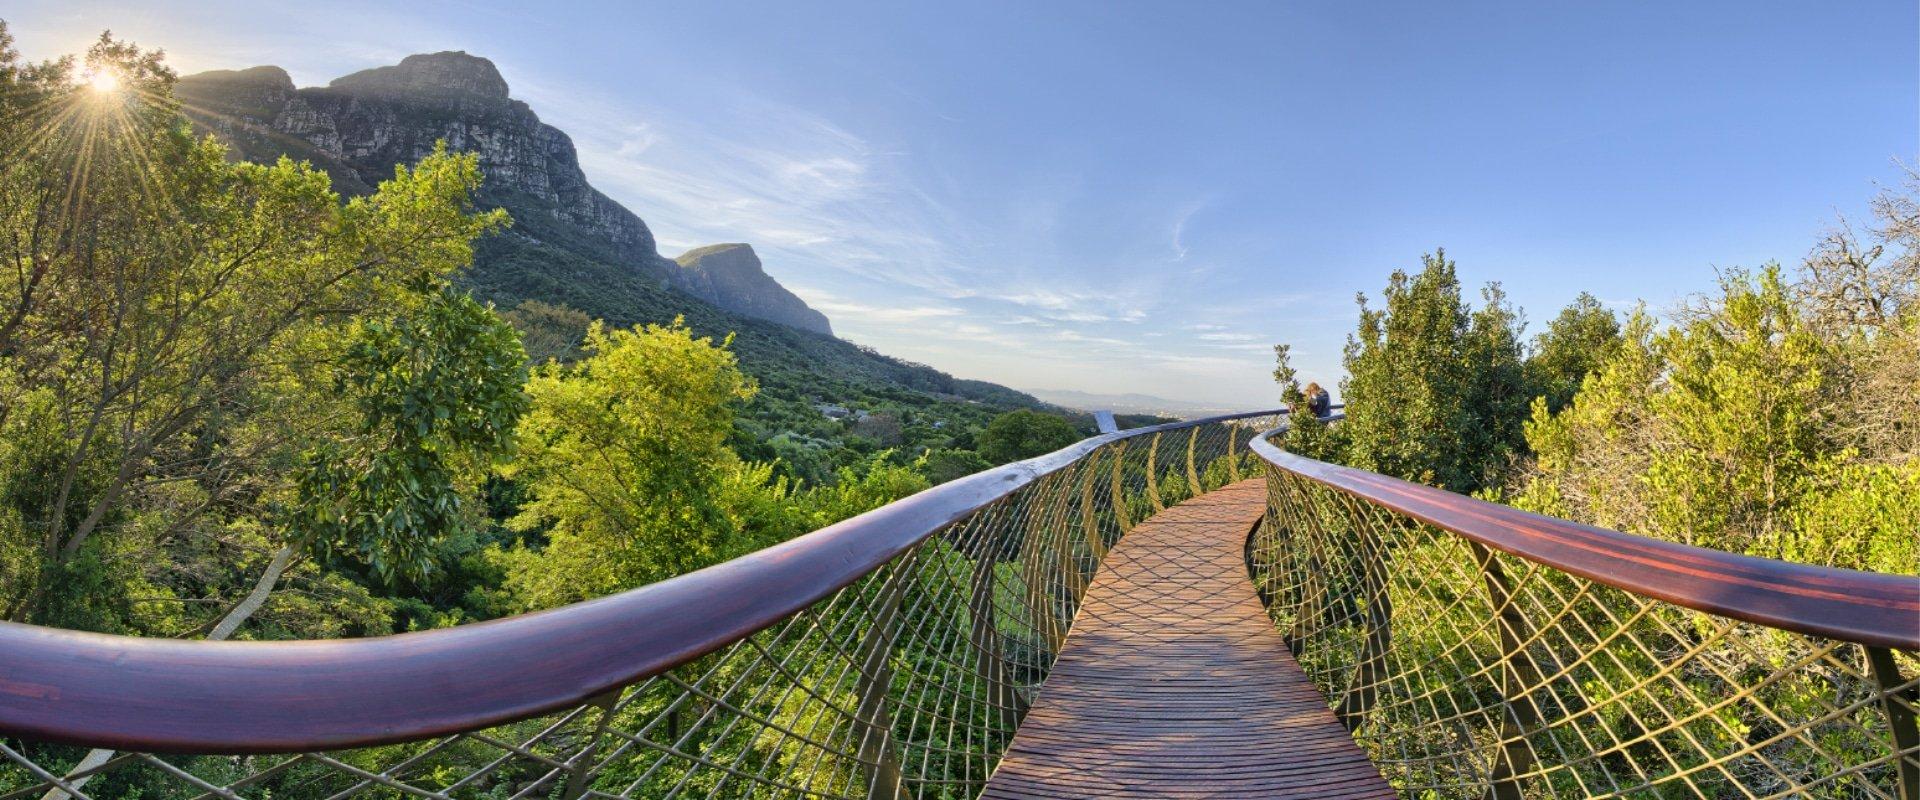 Stroll through Kirstenbosch Botanical Gardens